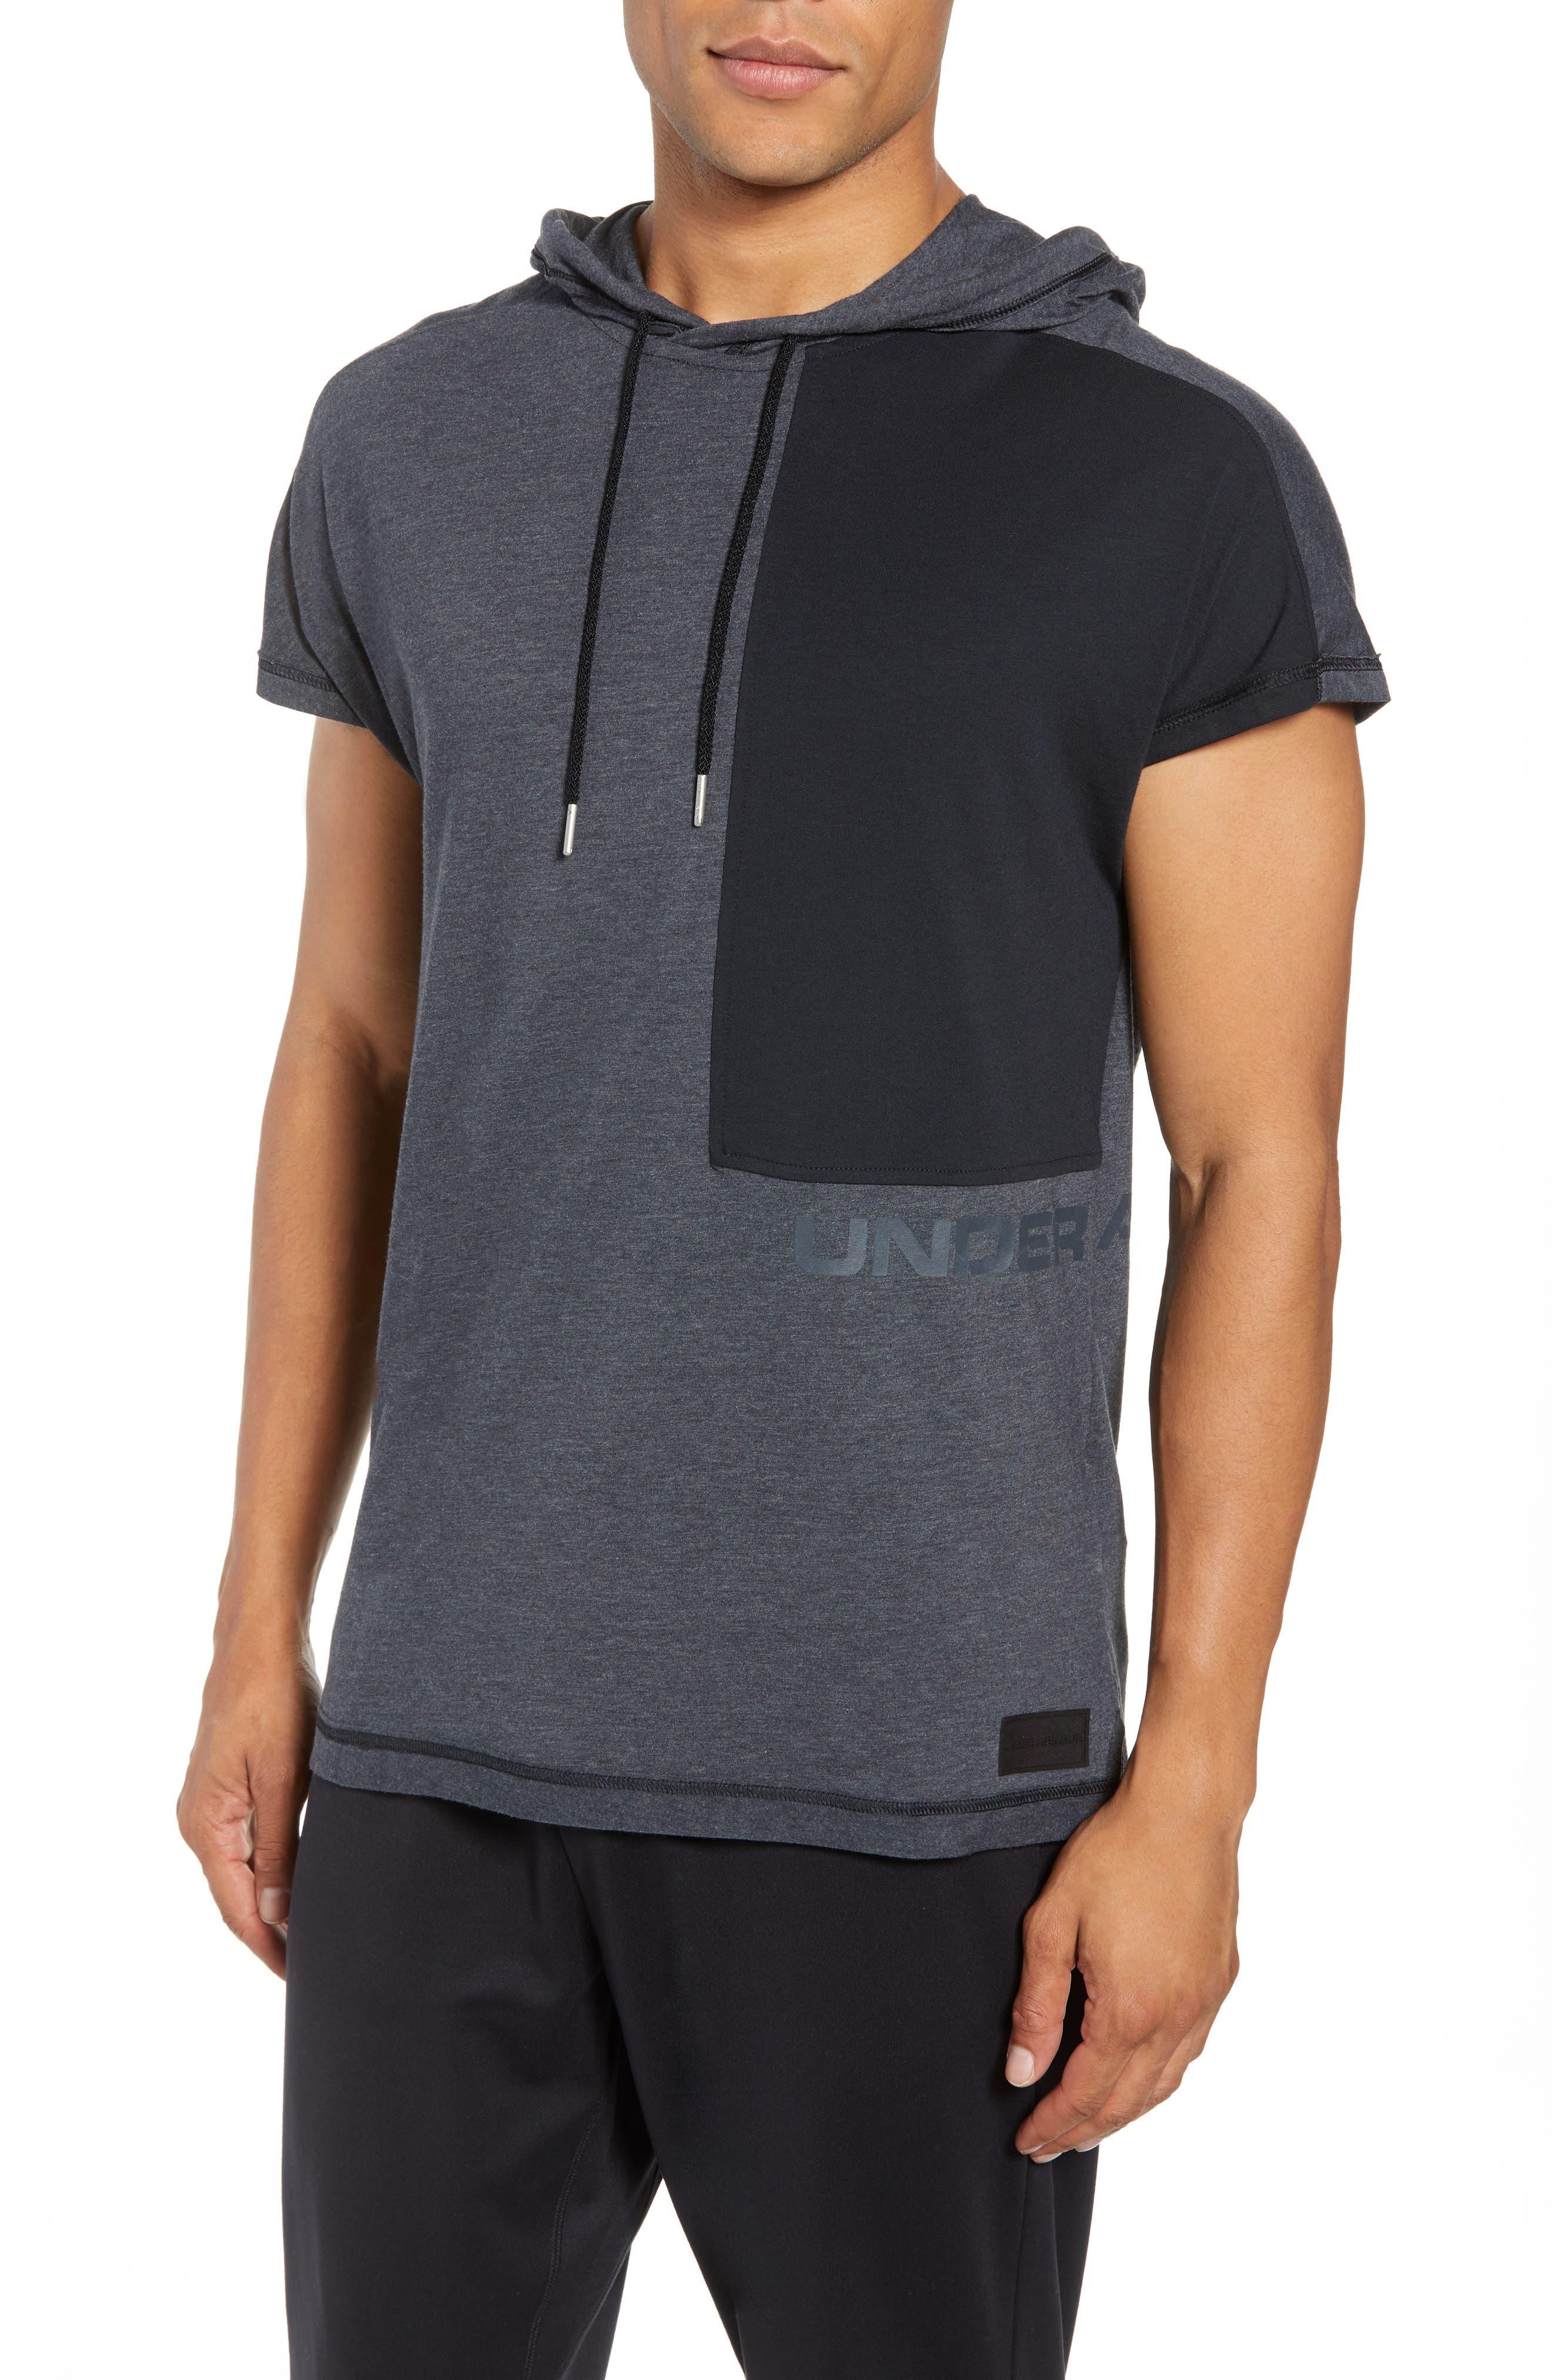 Pursuit Short Sleeve Hoodie,                             Main thumbnail 1, color,                             Black/ Black/ Stealth Gray